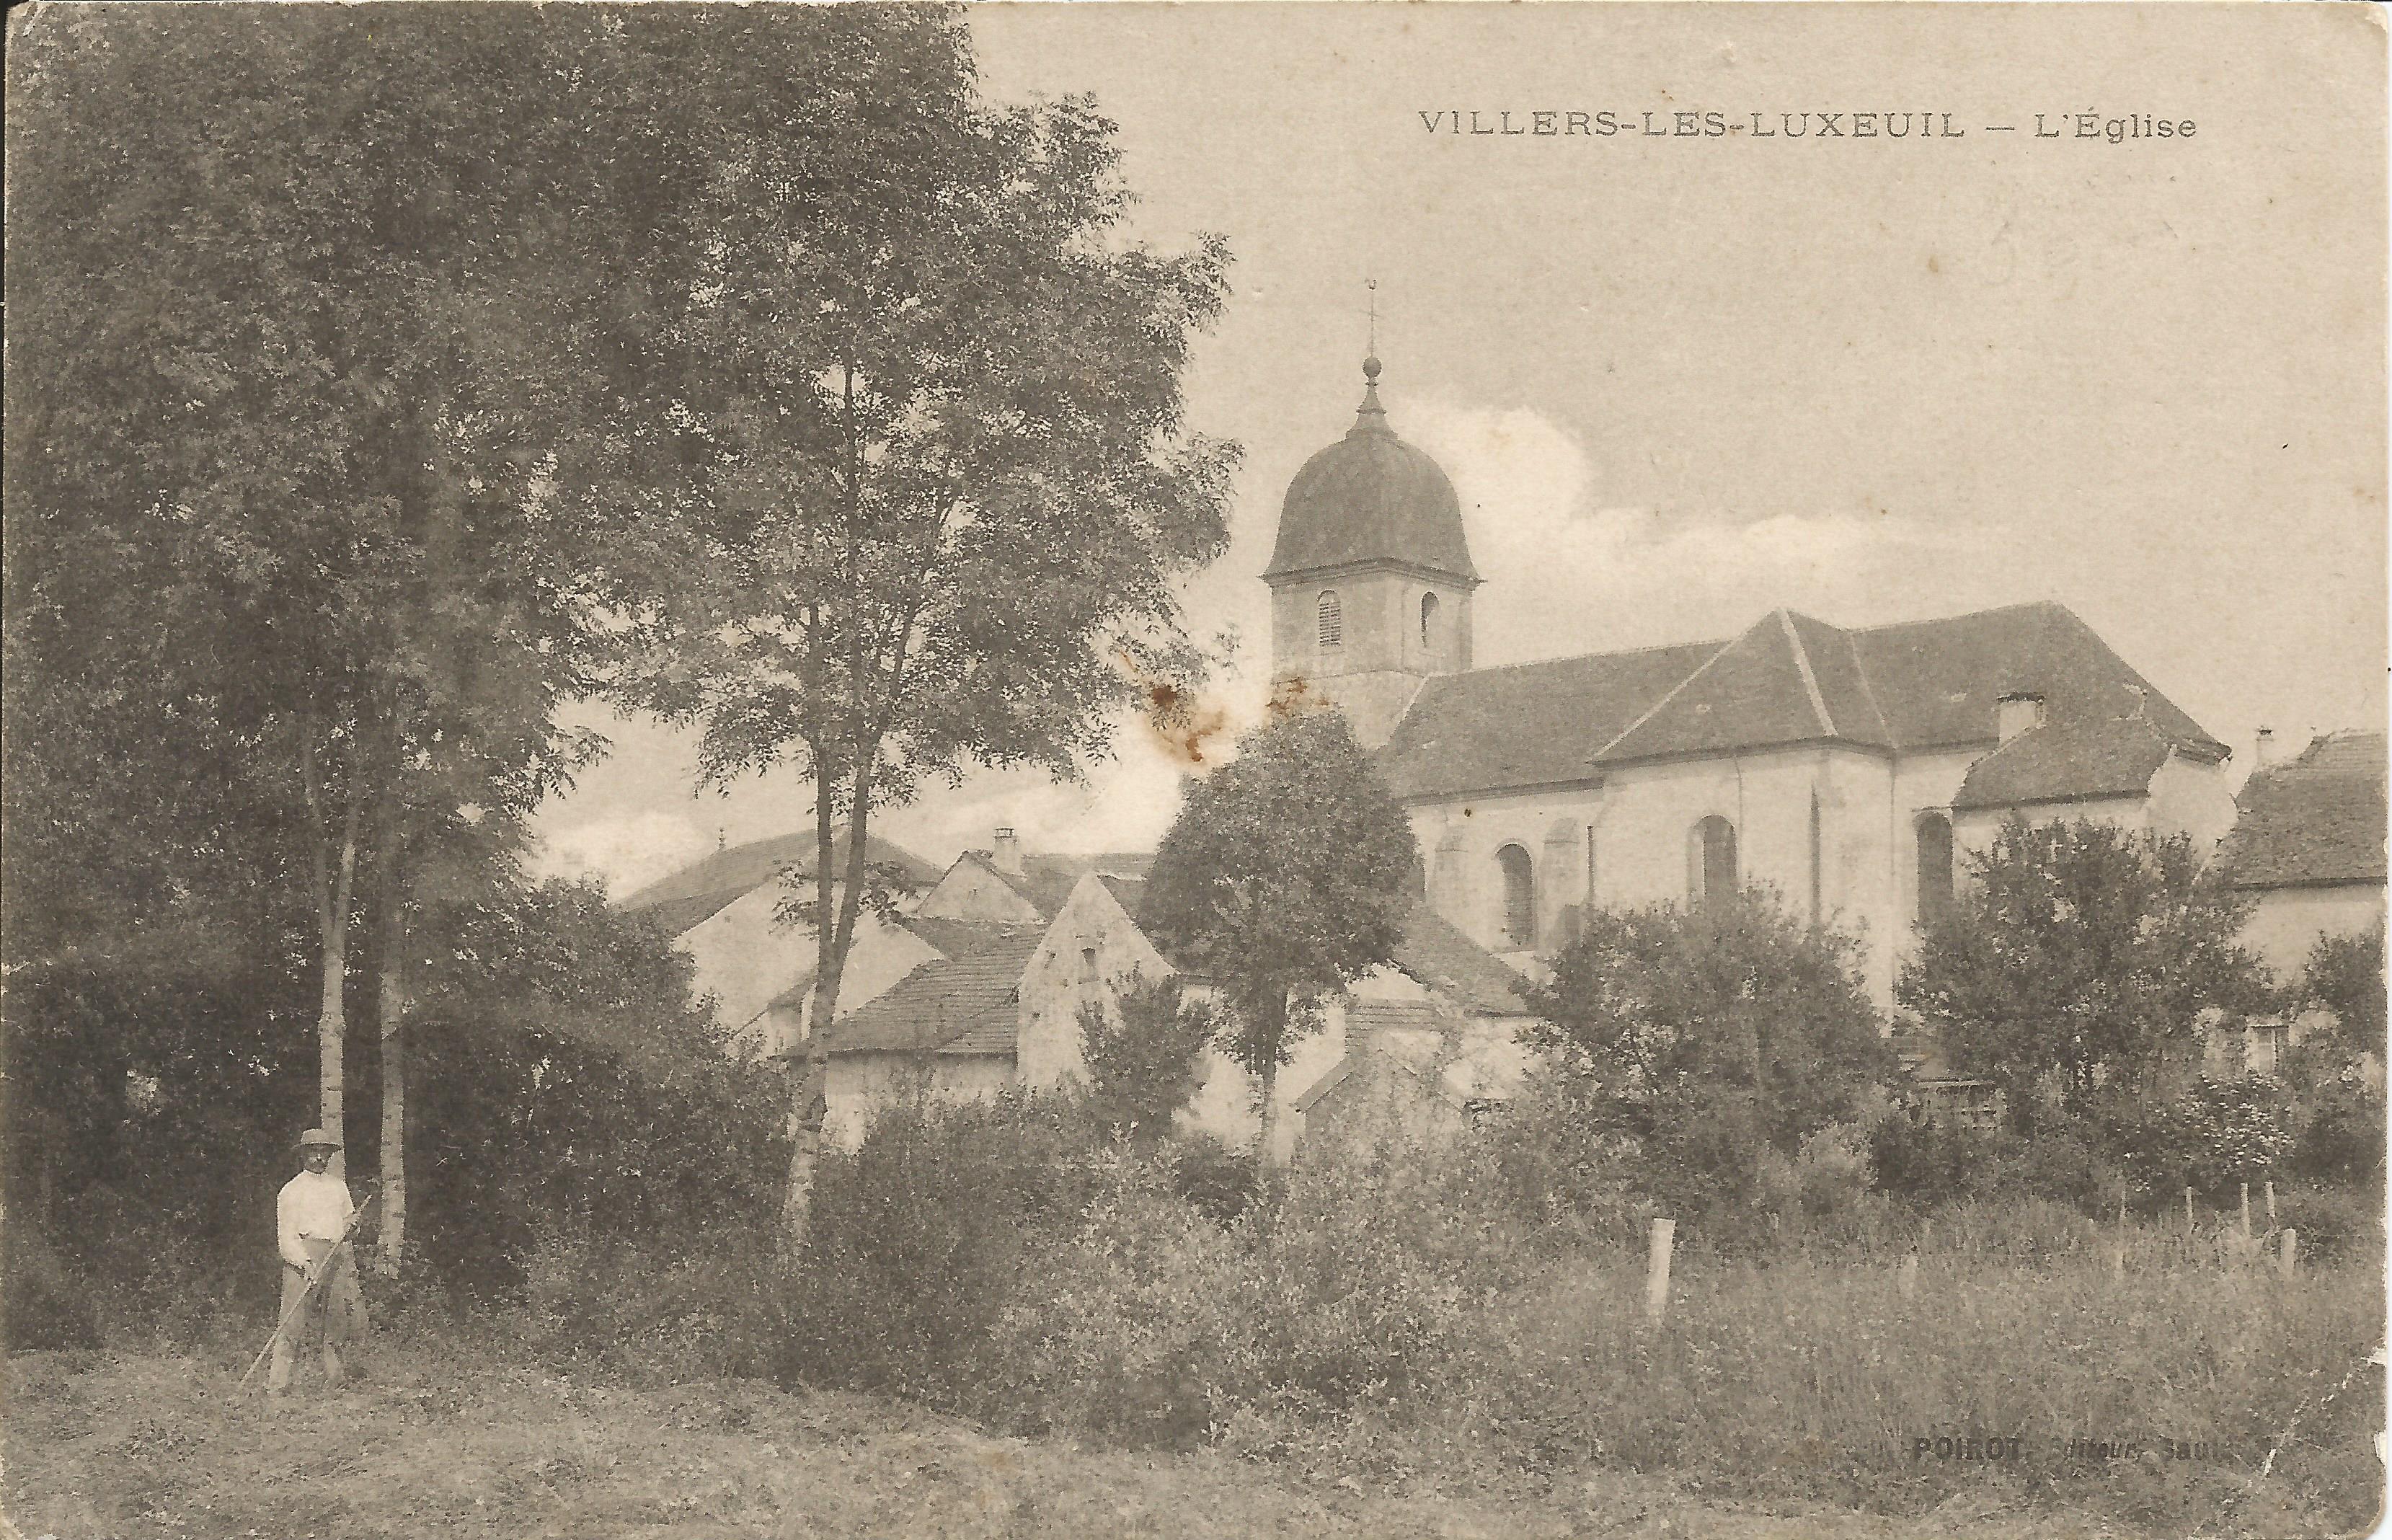 https://www.villers-les-luxeuil.com/projets/villers/files/images/Cartes_postales/Eglise_2015/LEglise_7_1917.jpg